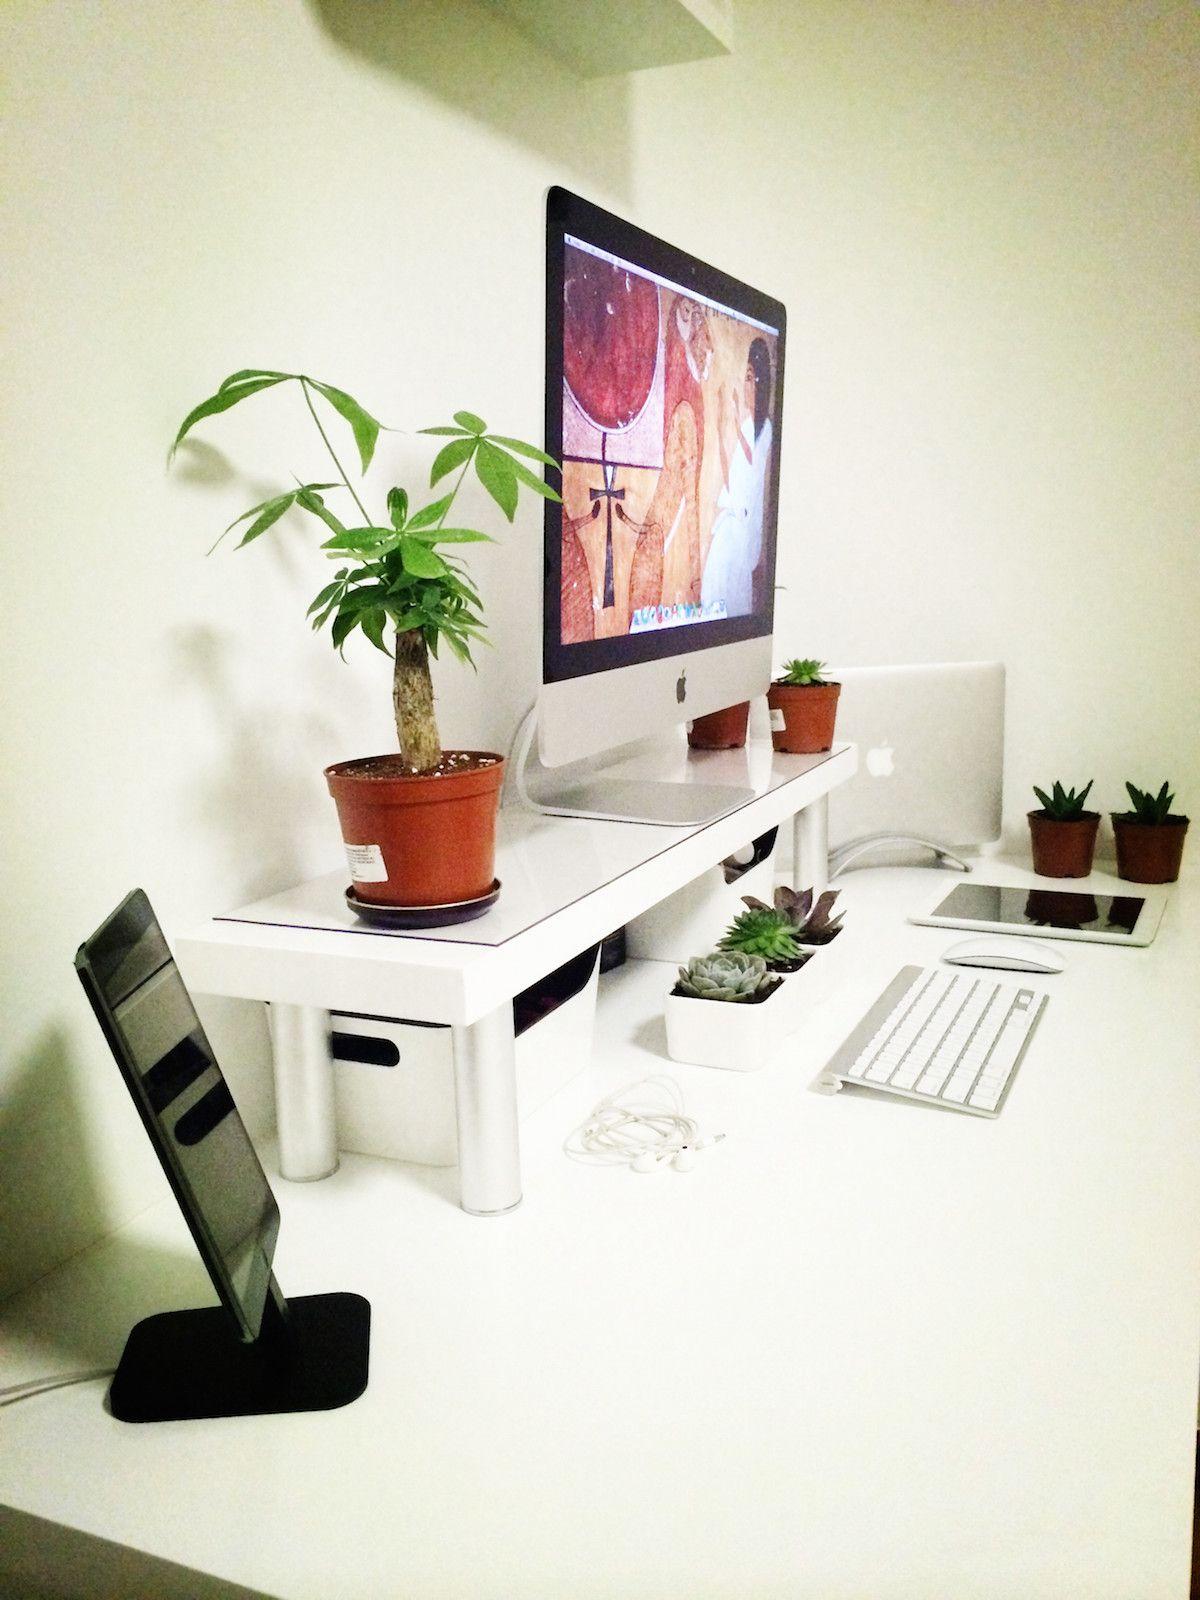 Appealing Computer Desk For Imac 27 Inch Images Decoration